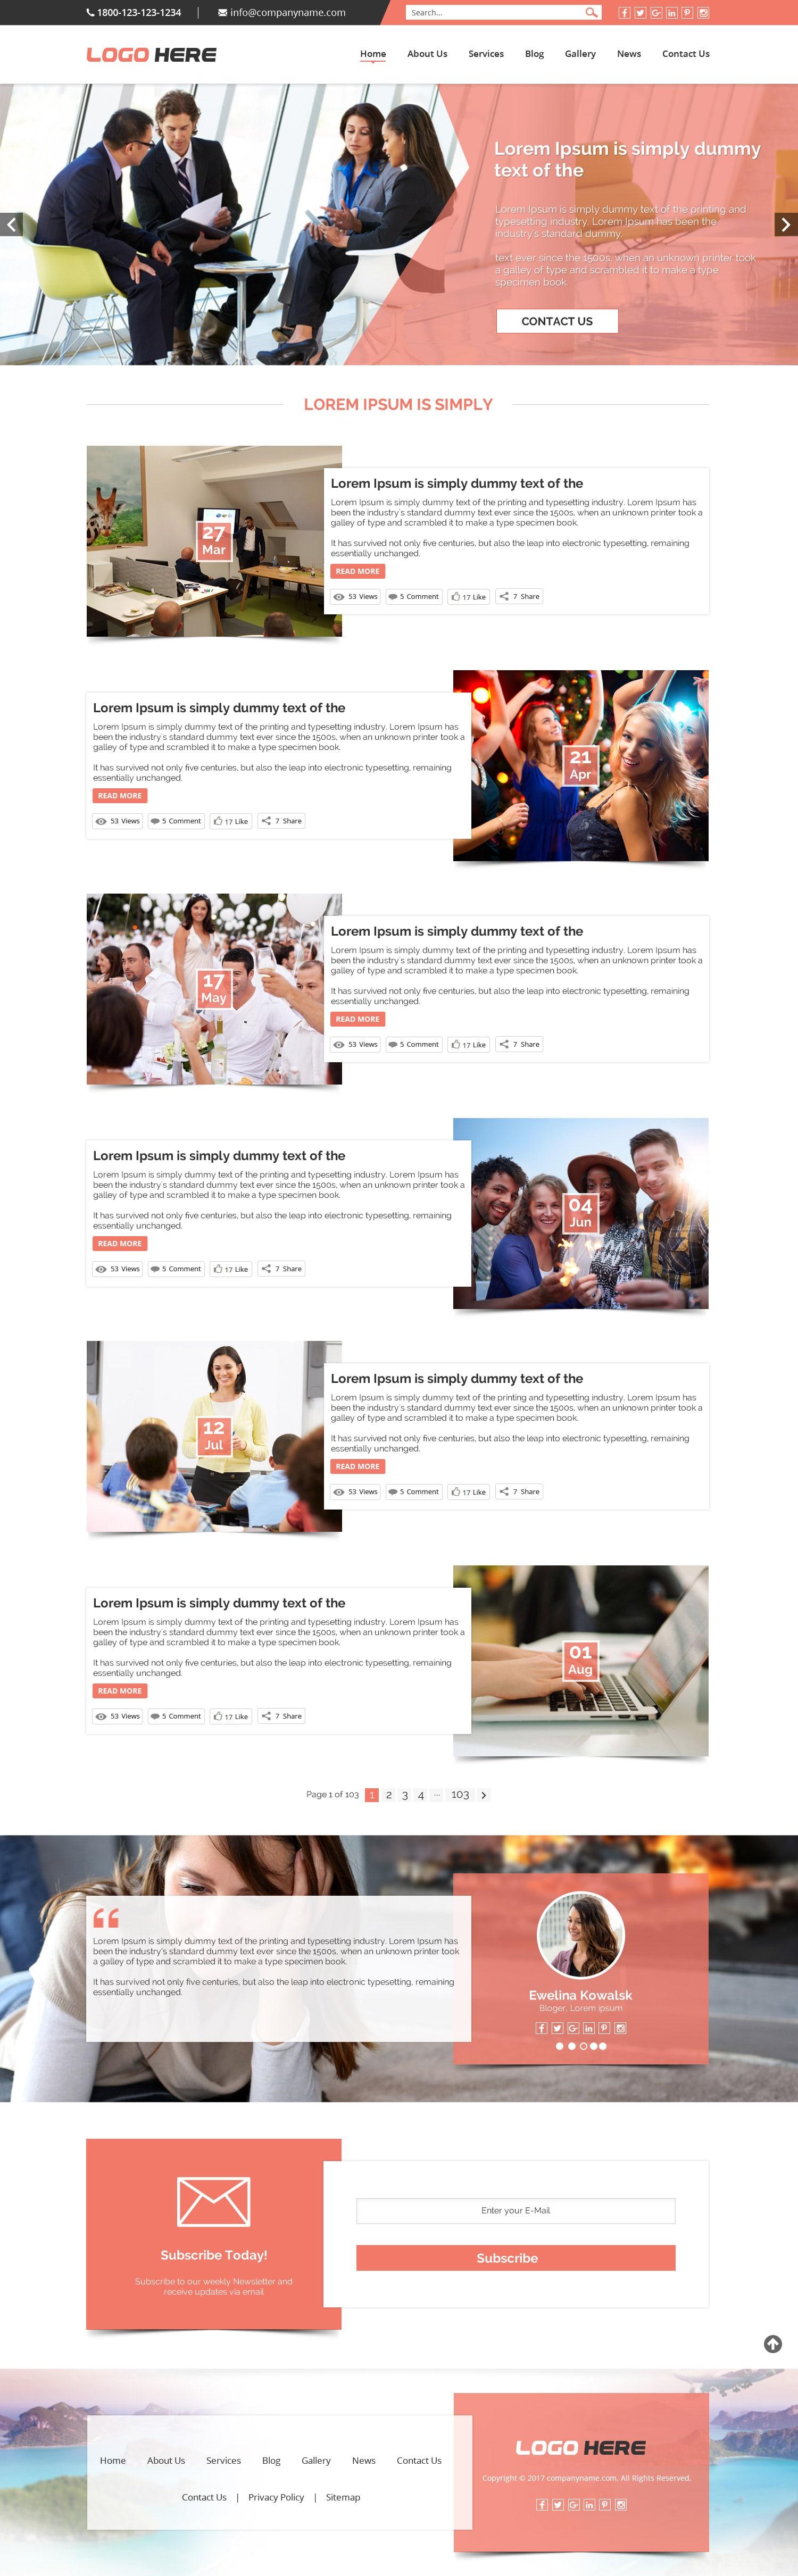 Creative blog website template design